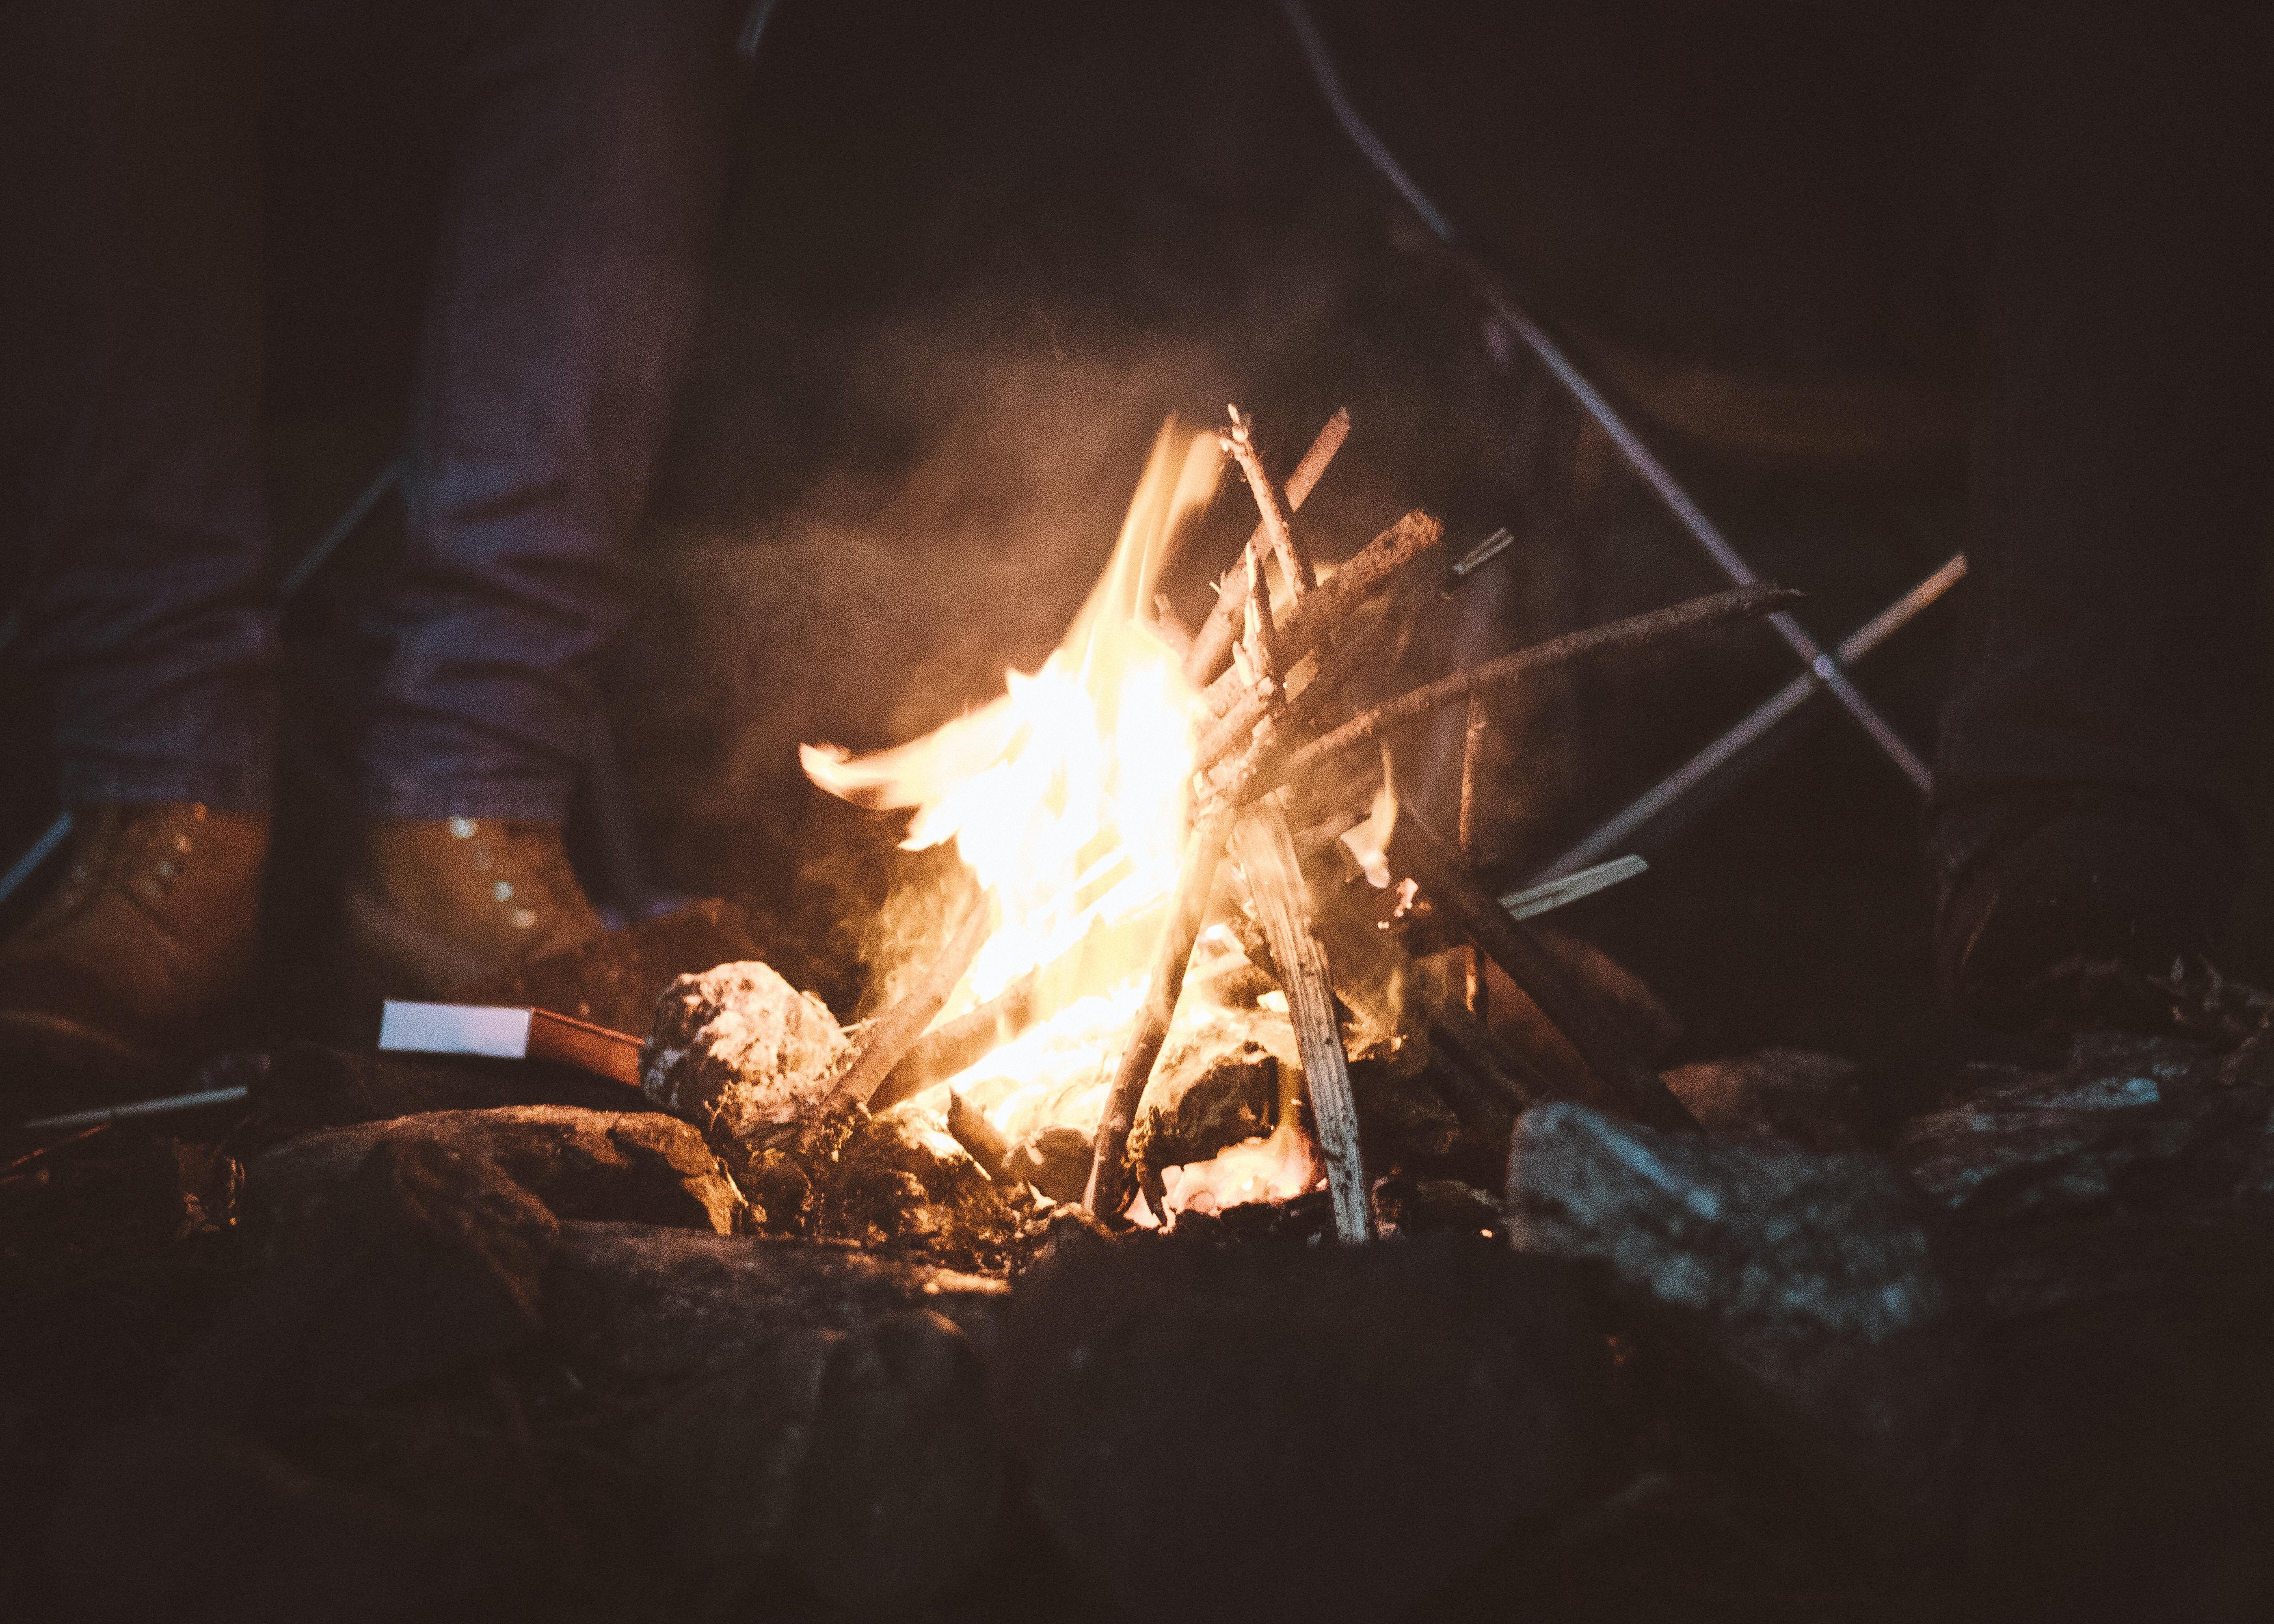 person standing near campfire